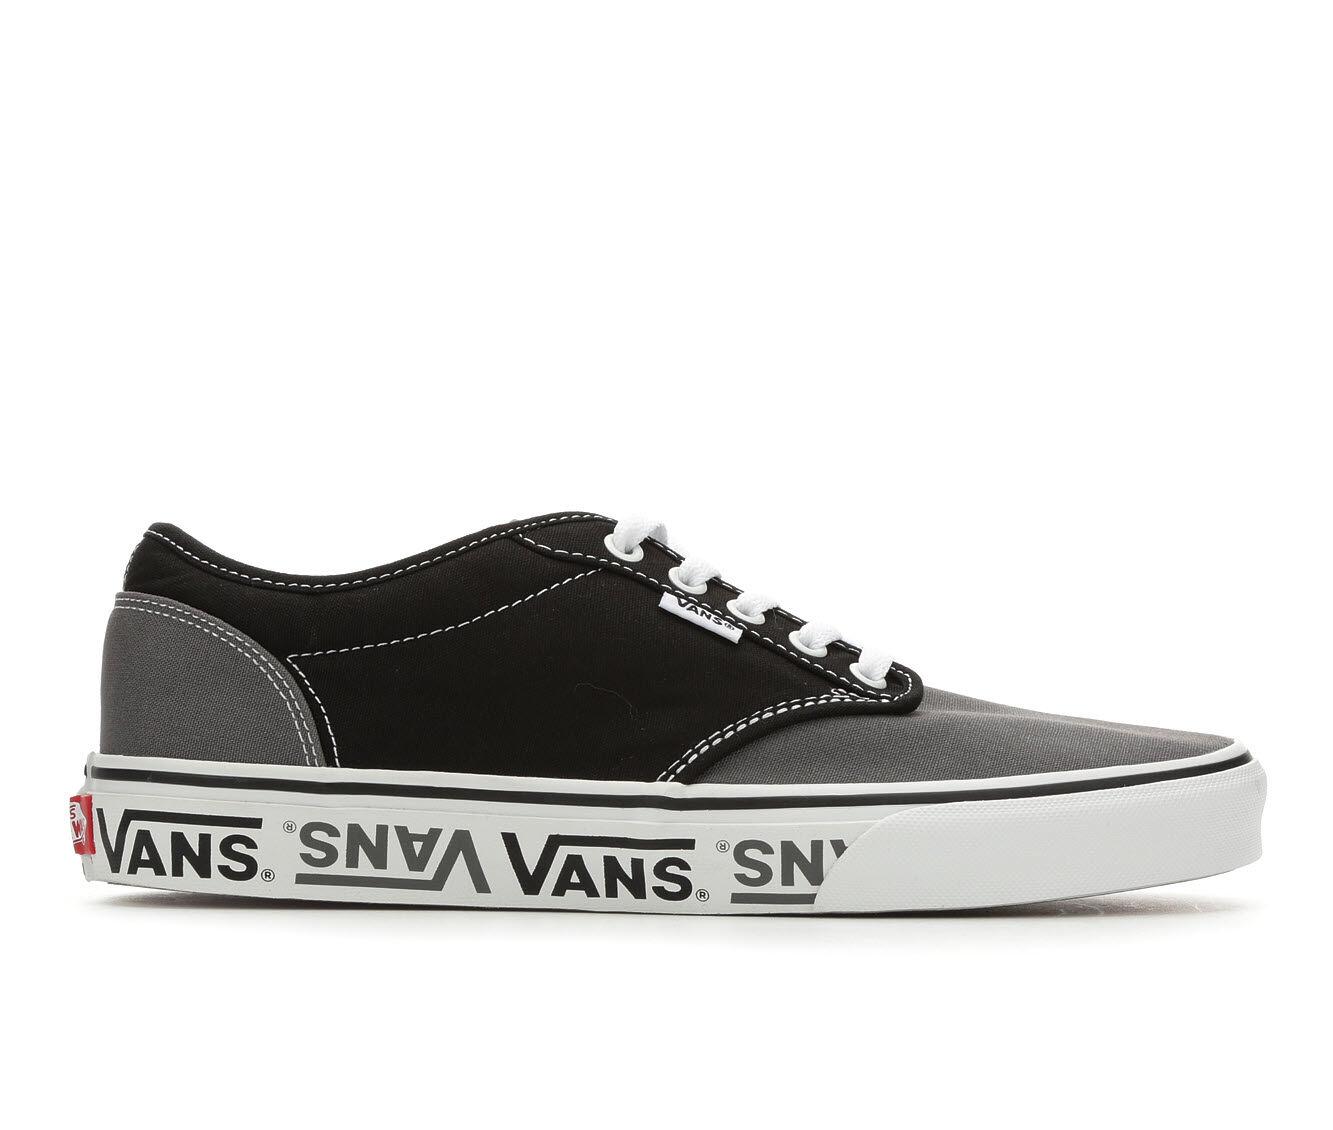 uk shoes_kd1732